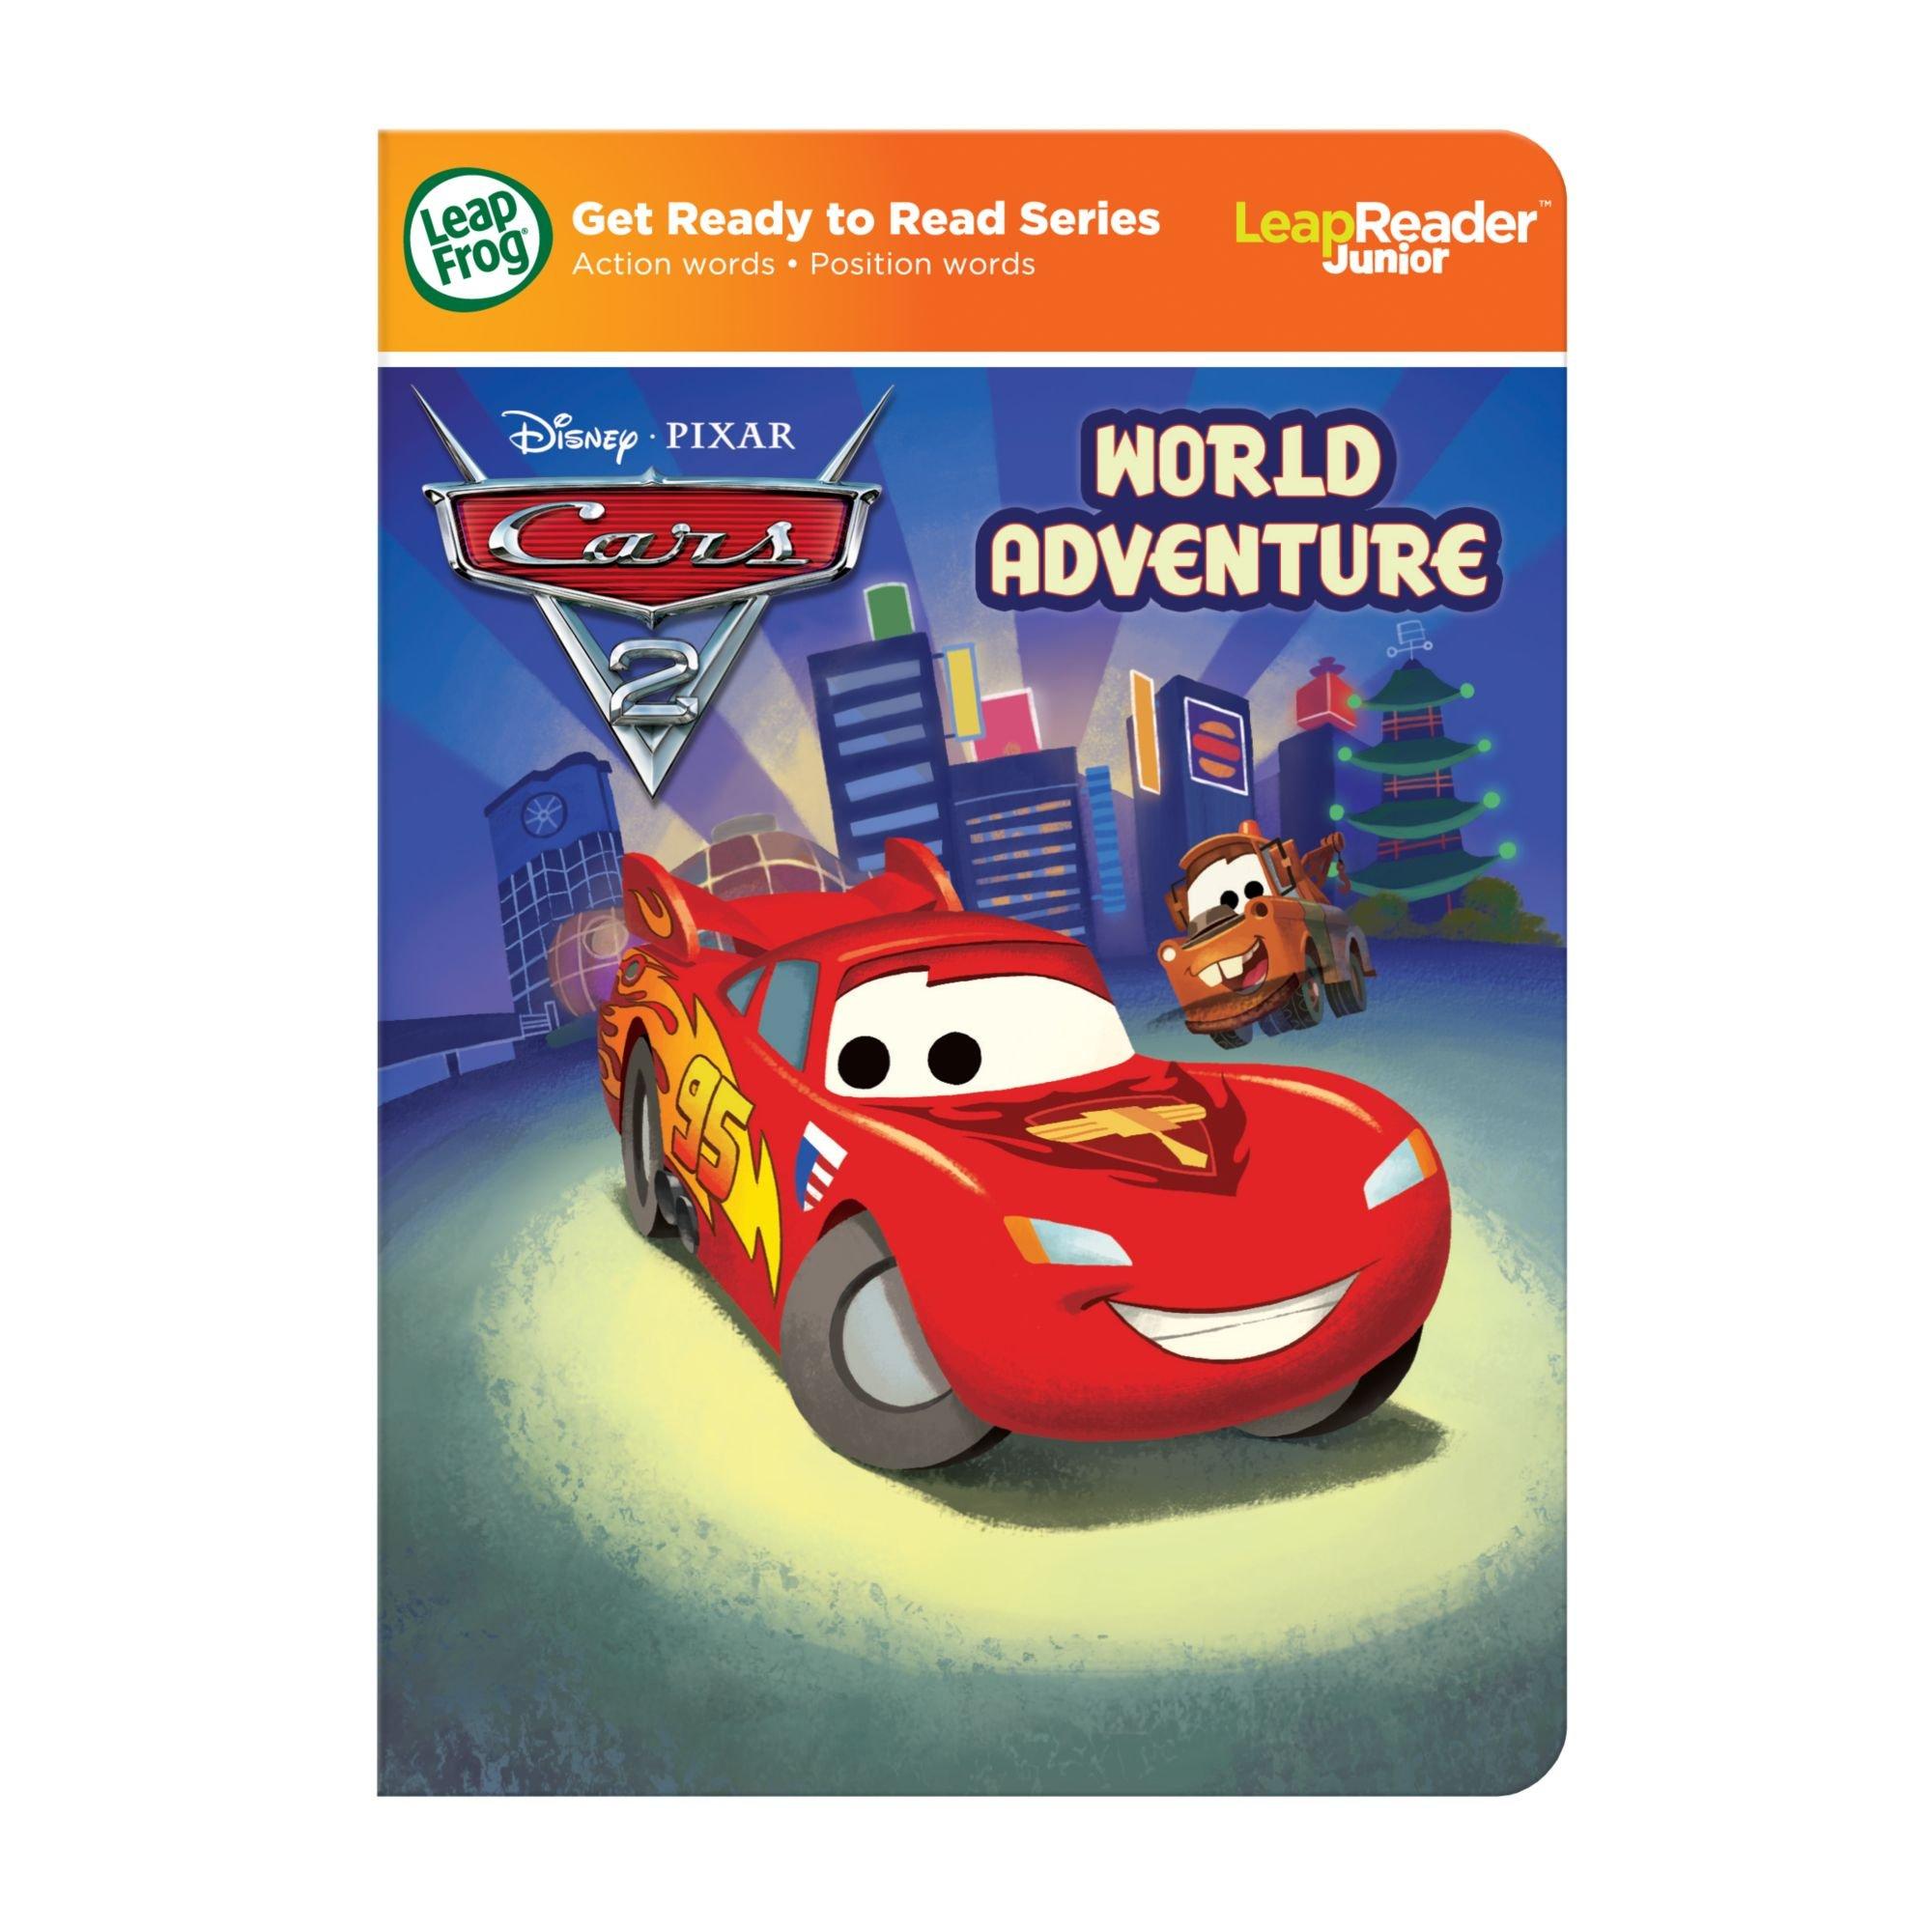 Leapfrog LeapReader Junior Book: DisneyPixar Cars 2: World Adventure (works with Tag Junior) by LeapFrog (Image #7)